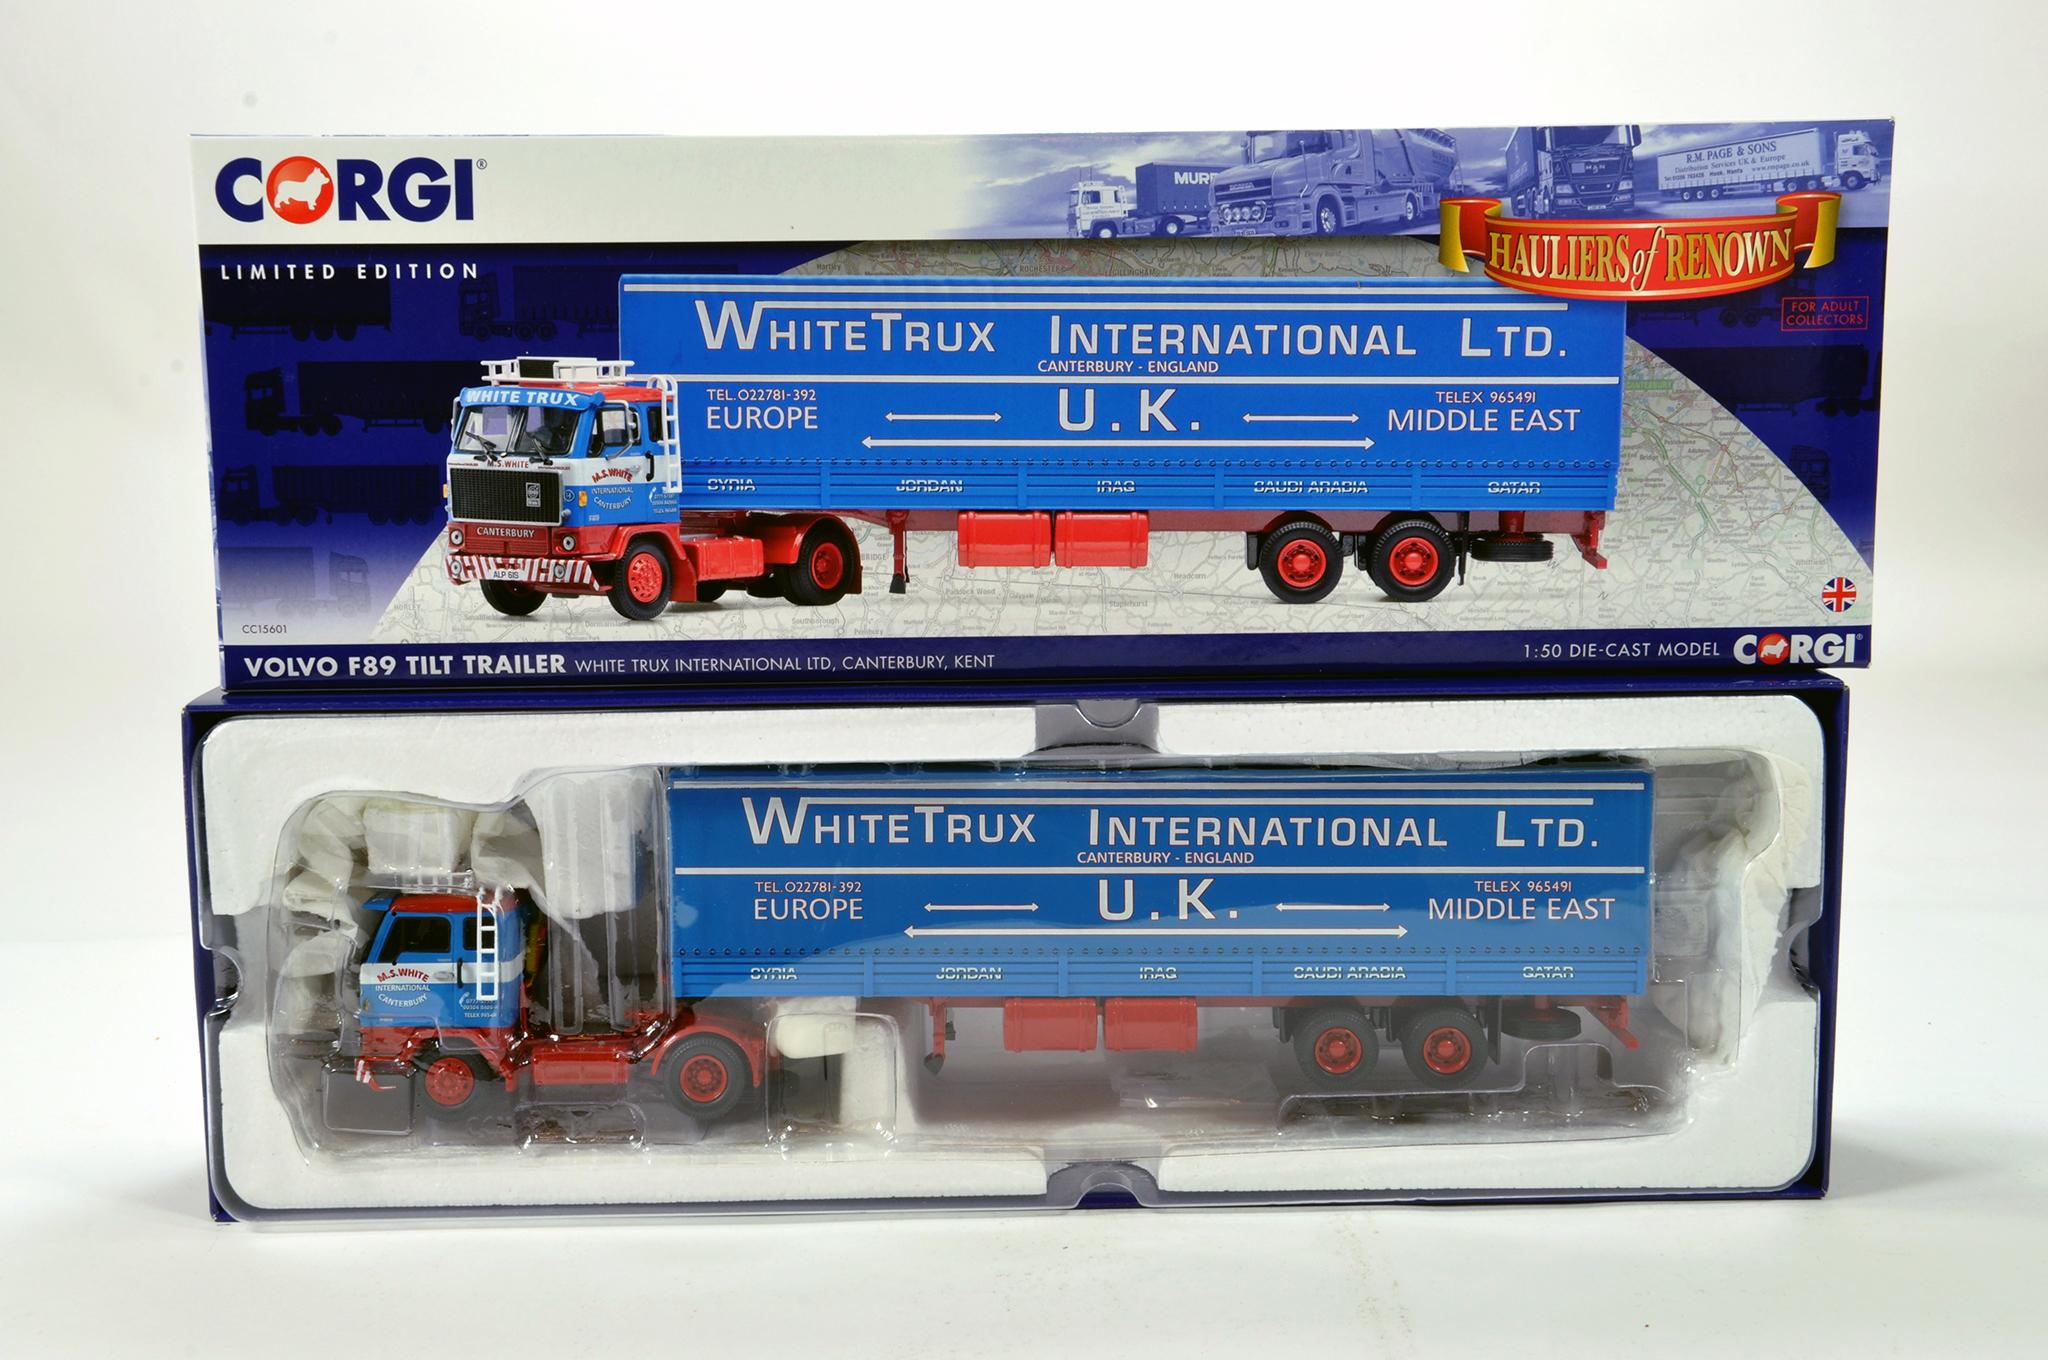 Lot 5 - Corgi 1/50 diecast truck issue comprising No. CC15601 Volvo F89 Tilt Trailer in livery of White Trux